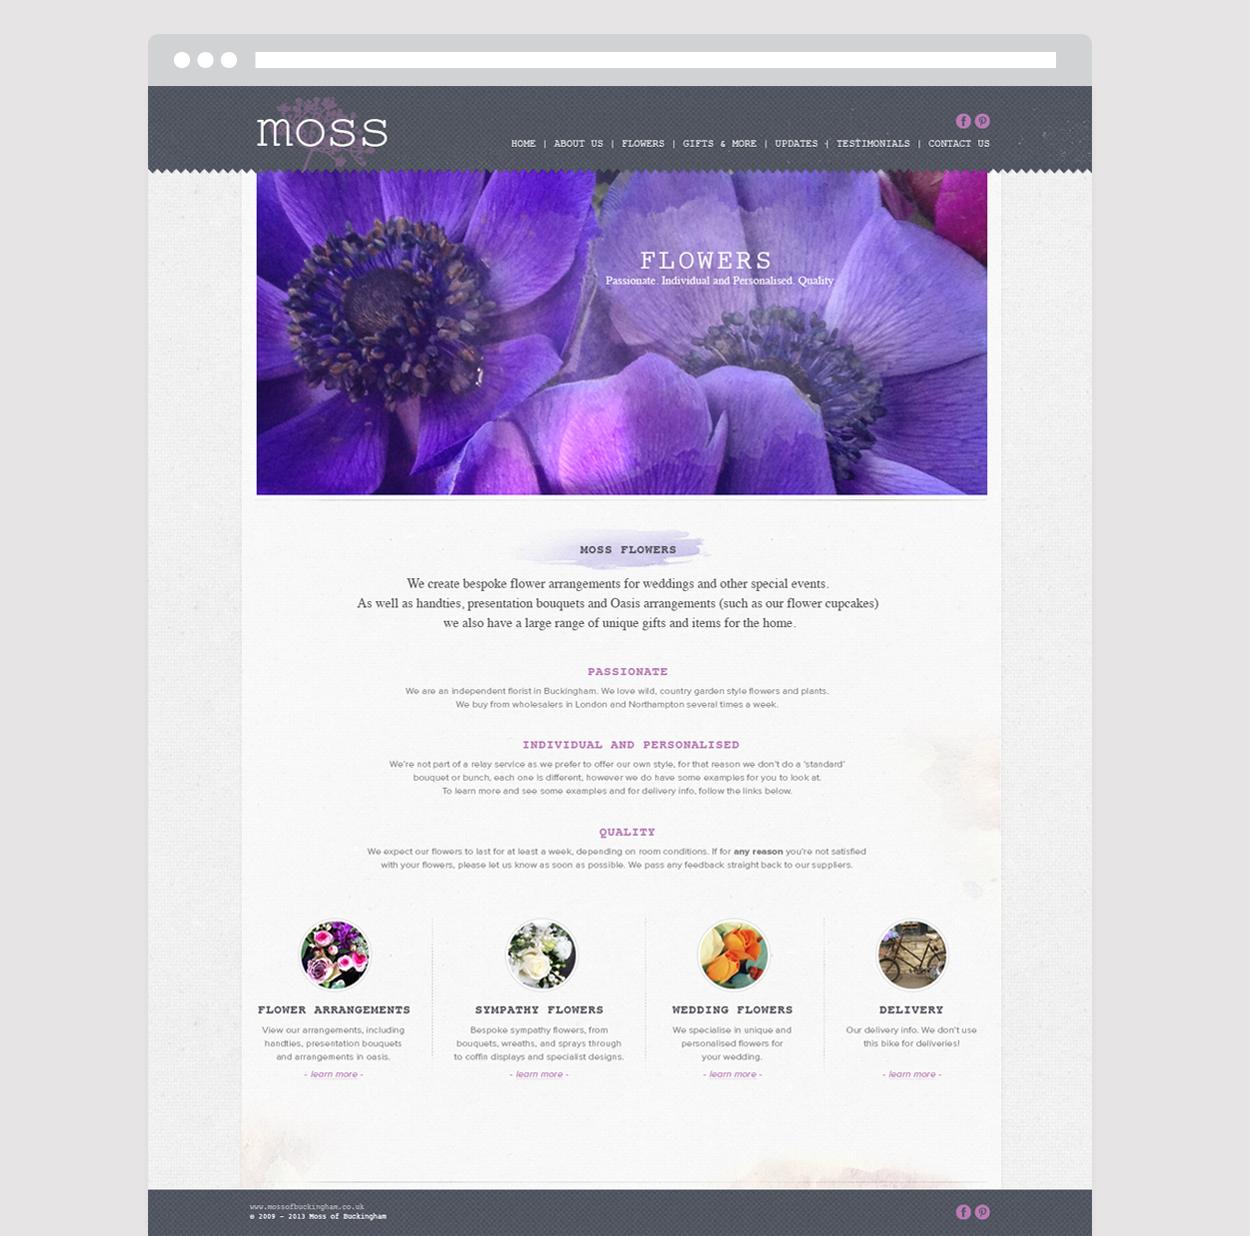 flowers_moss